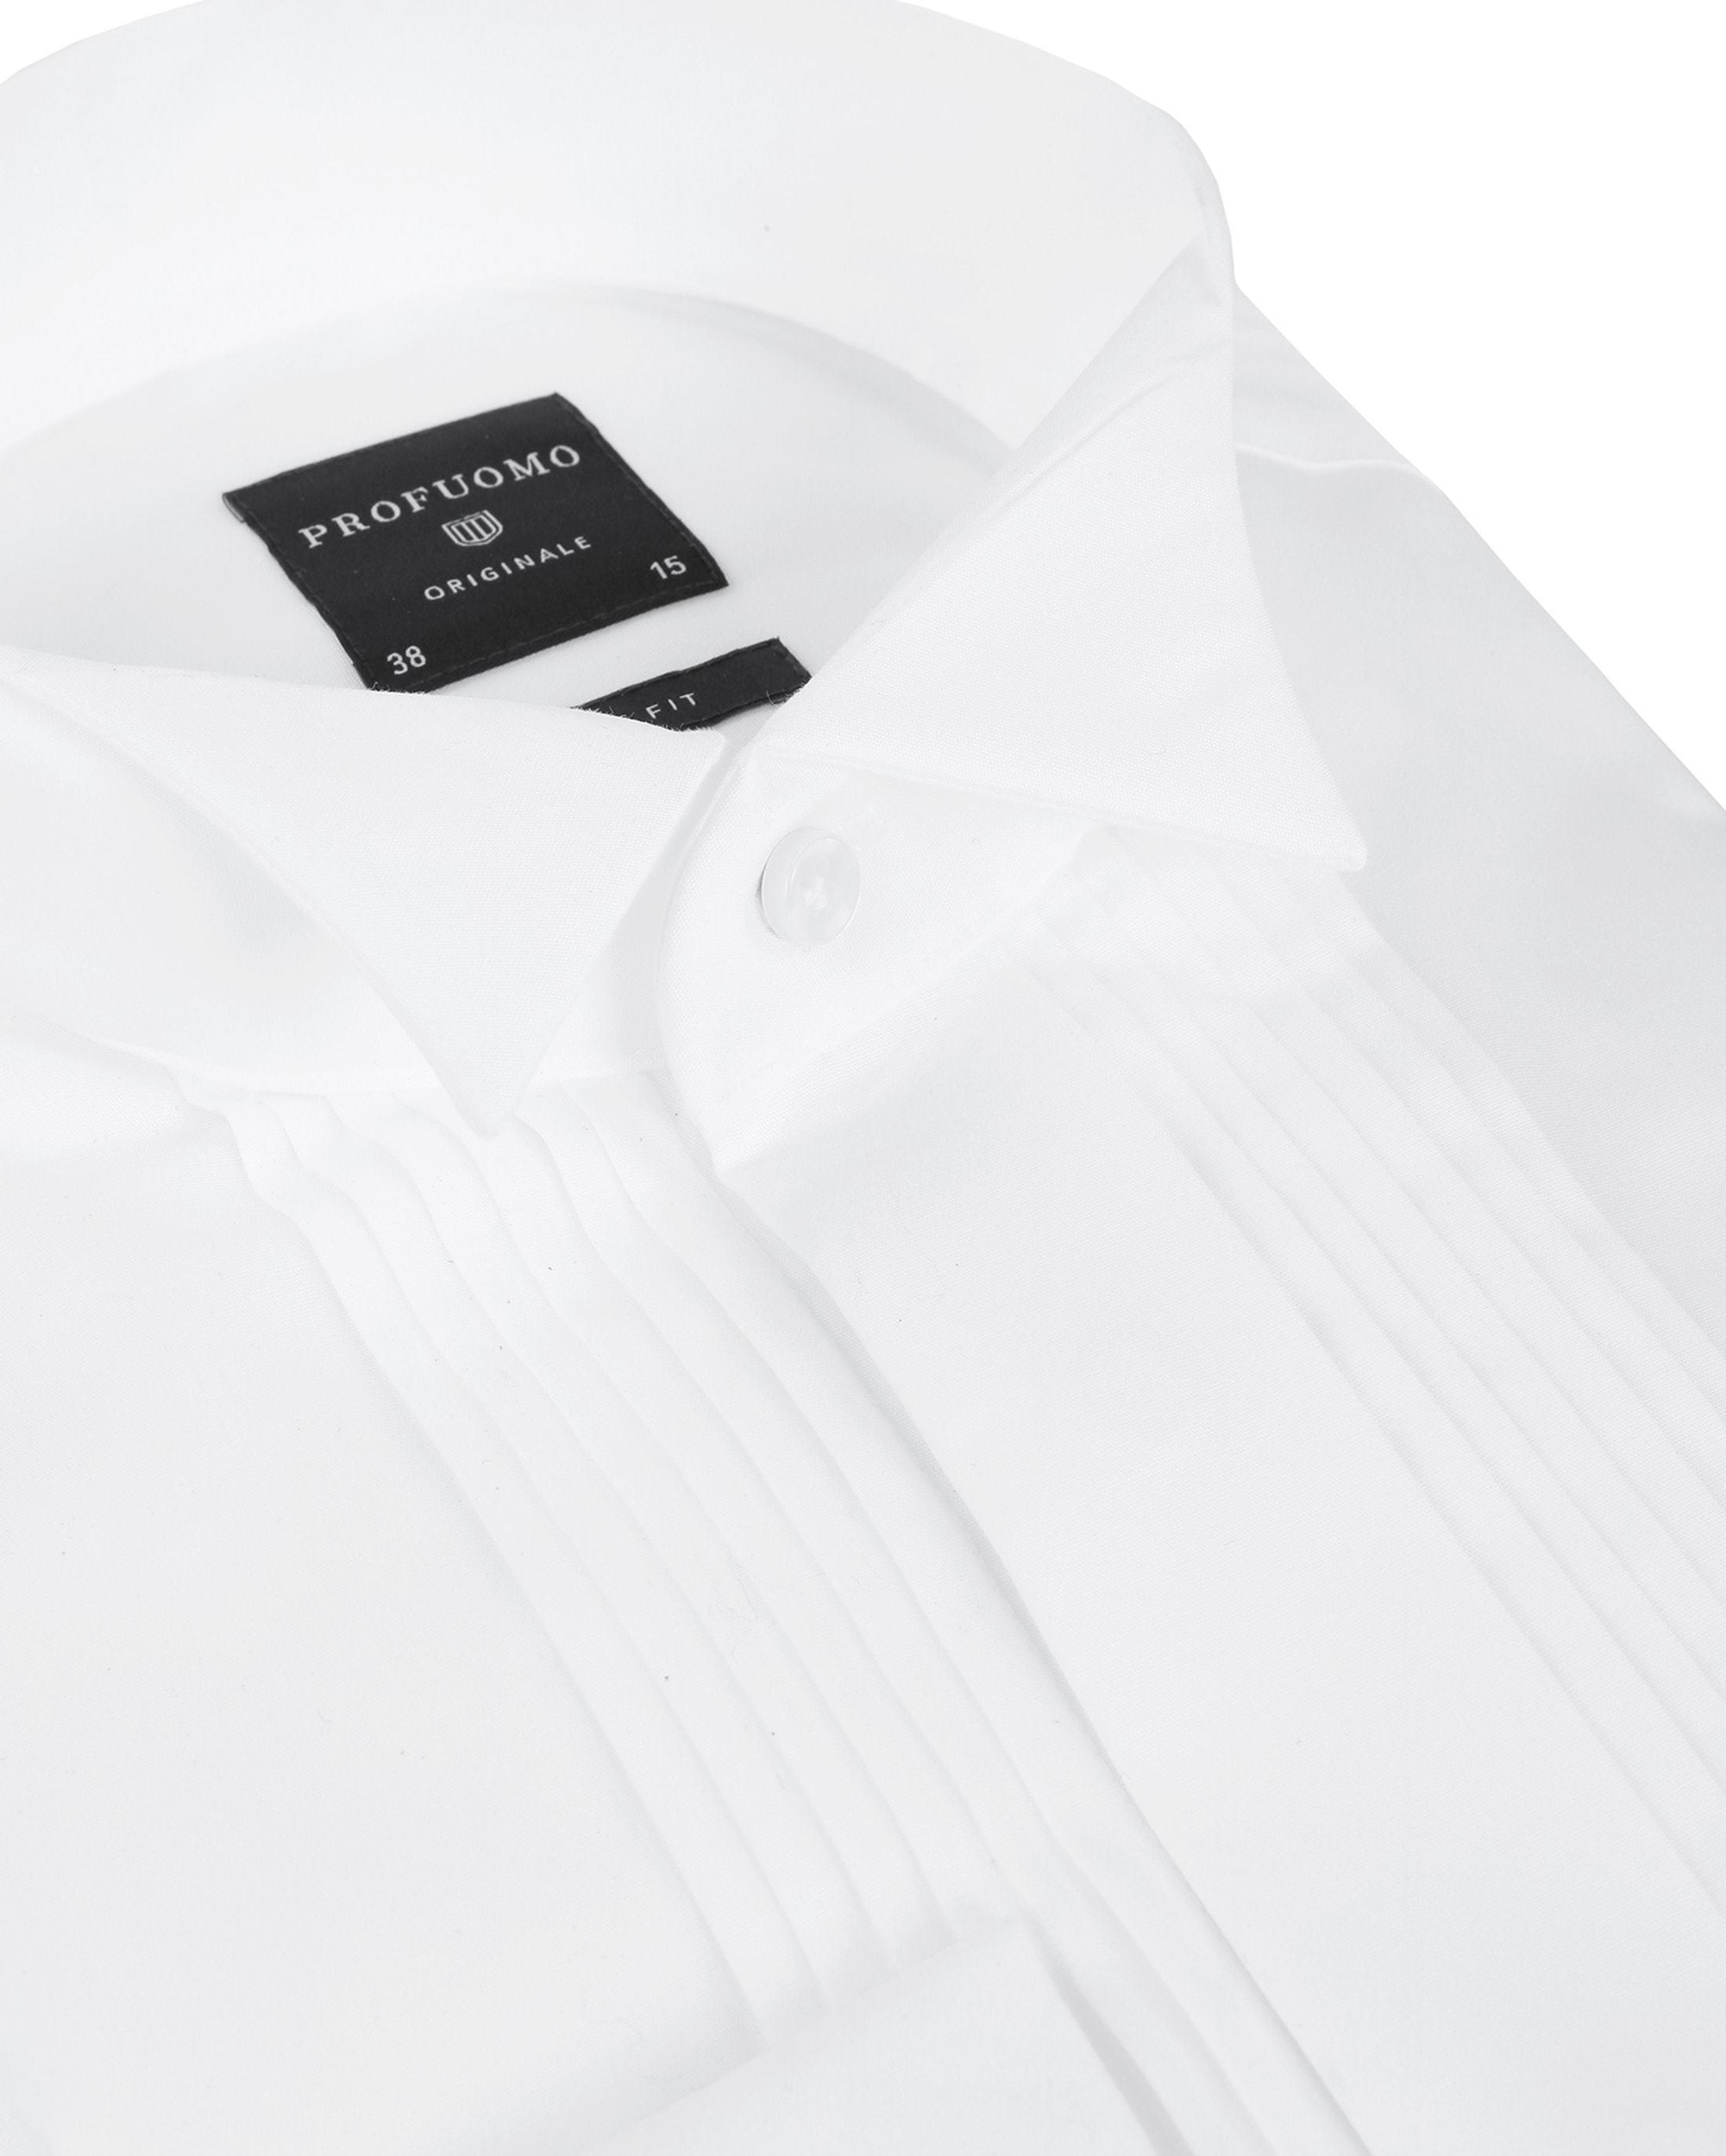 Profuomo Smoking Hemd Plissiert Slim Fit Weiß foto 1